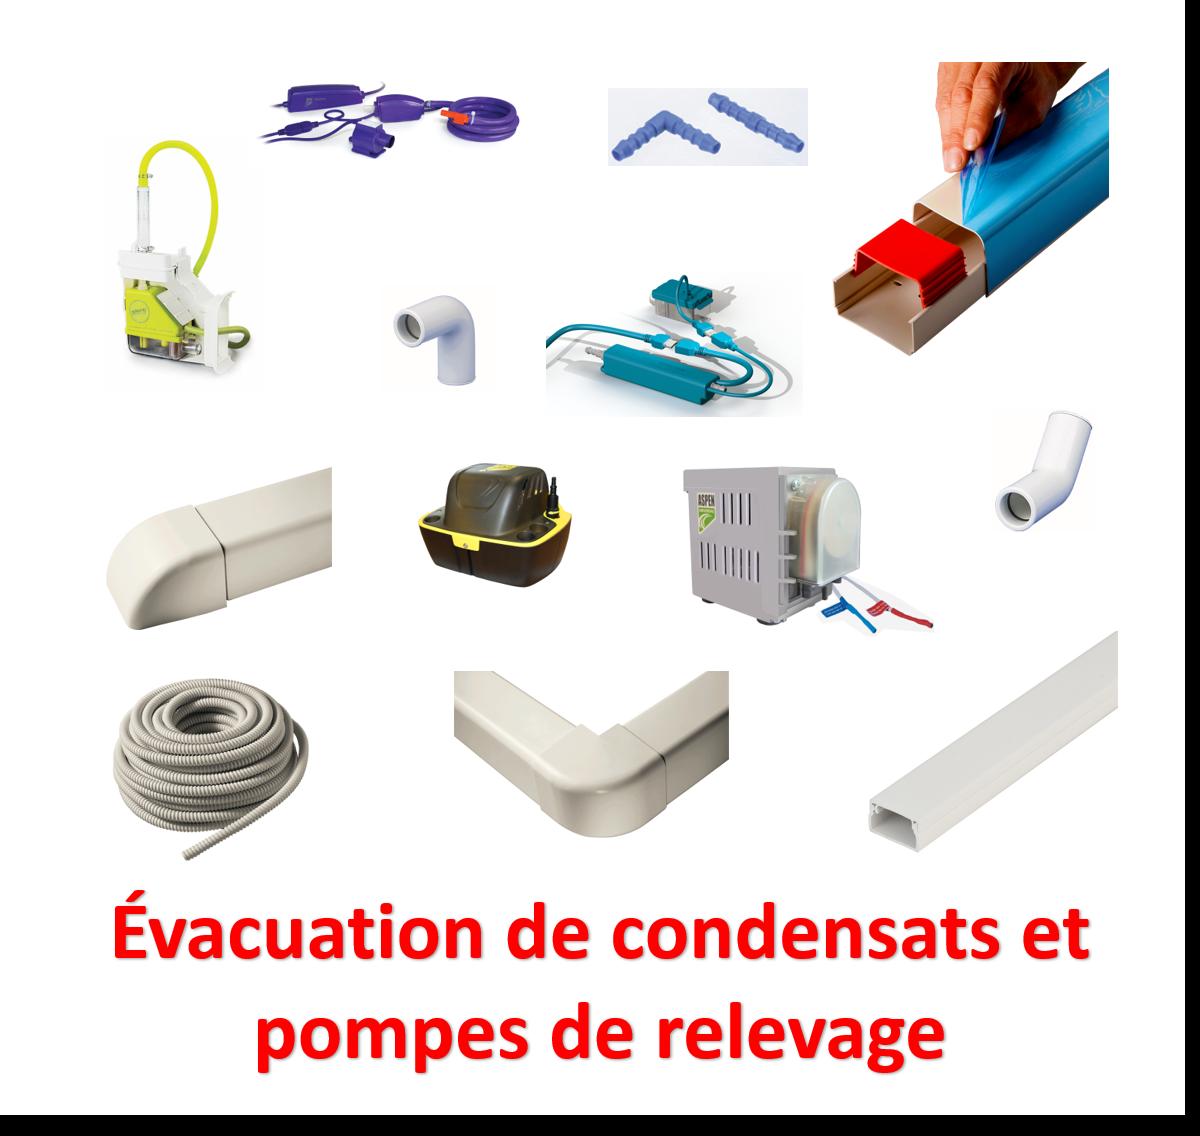 Evacuation de condensats et pompes de relevage